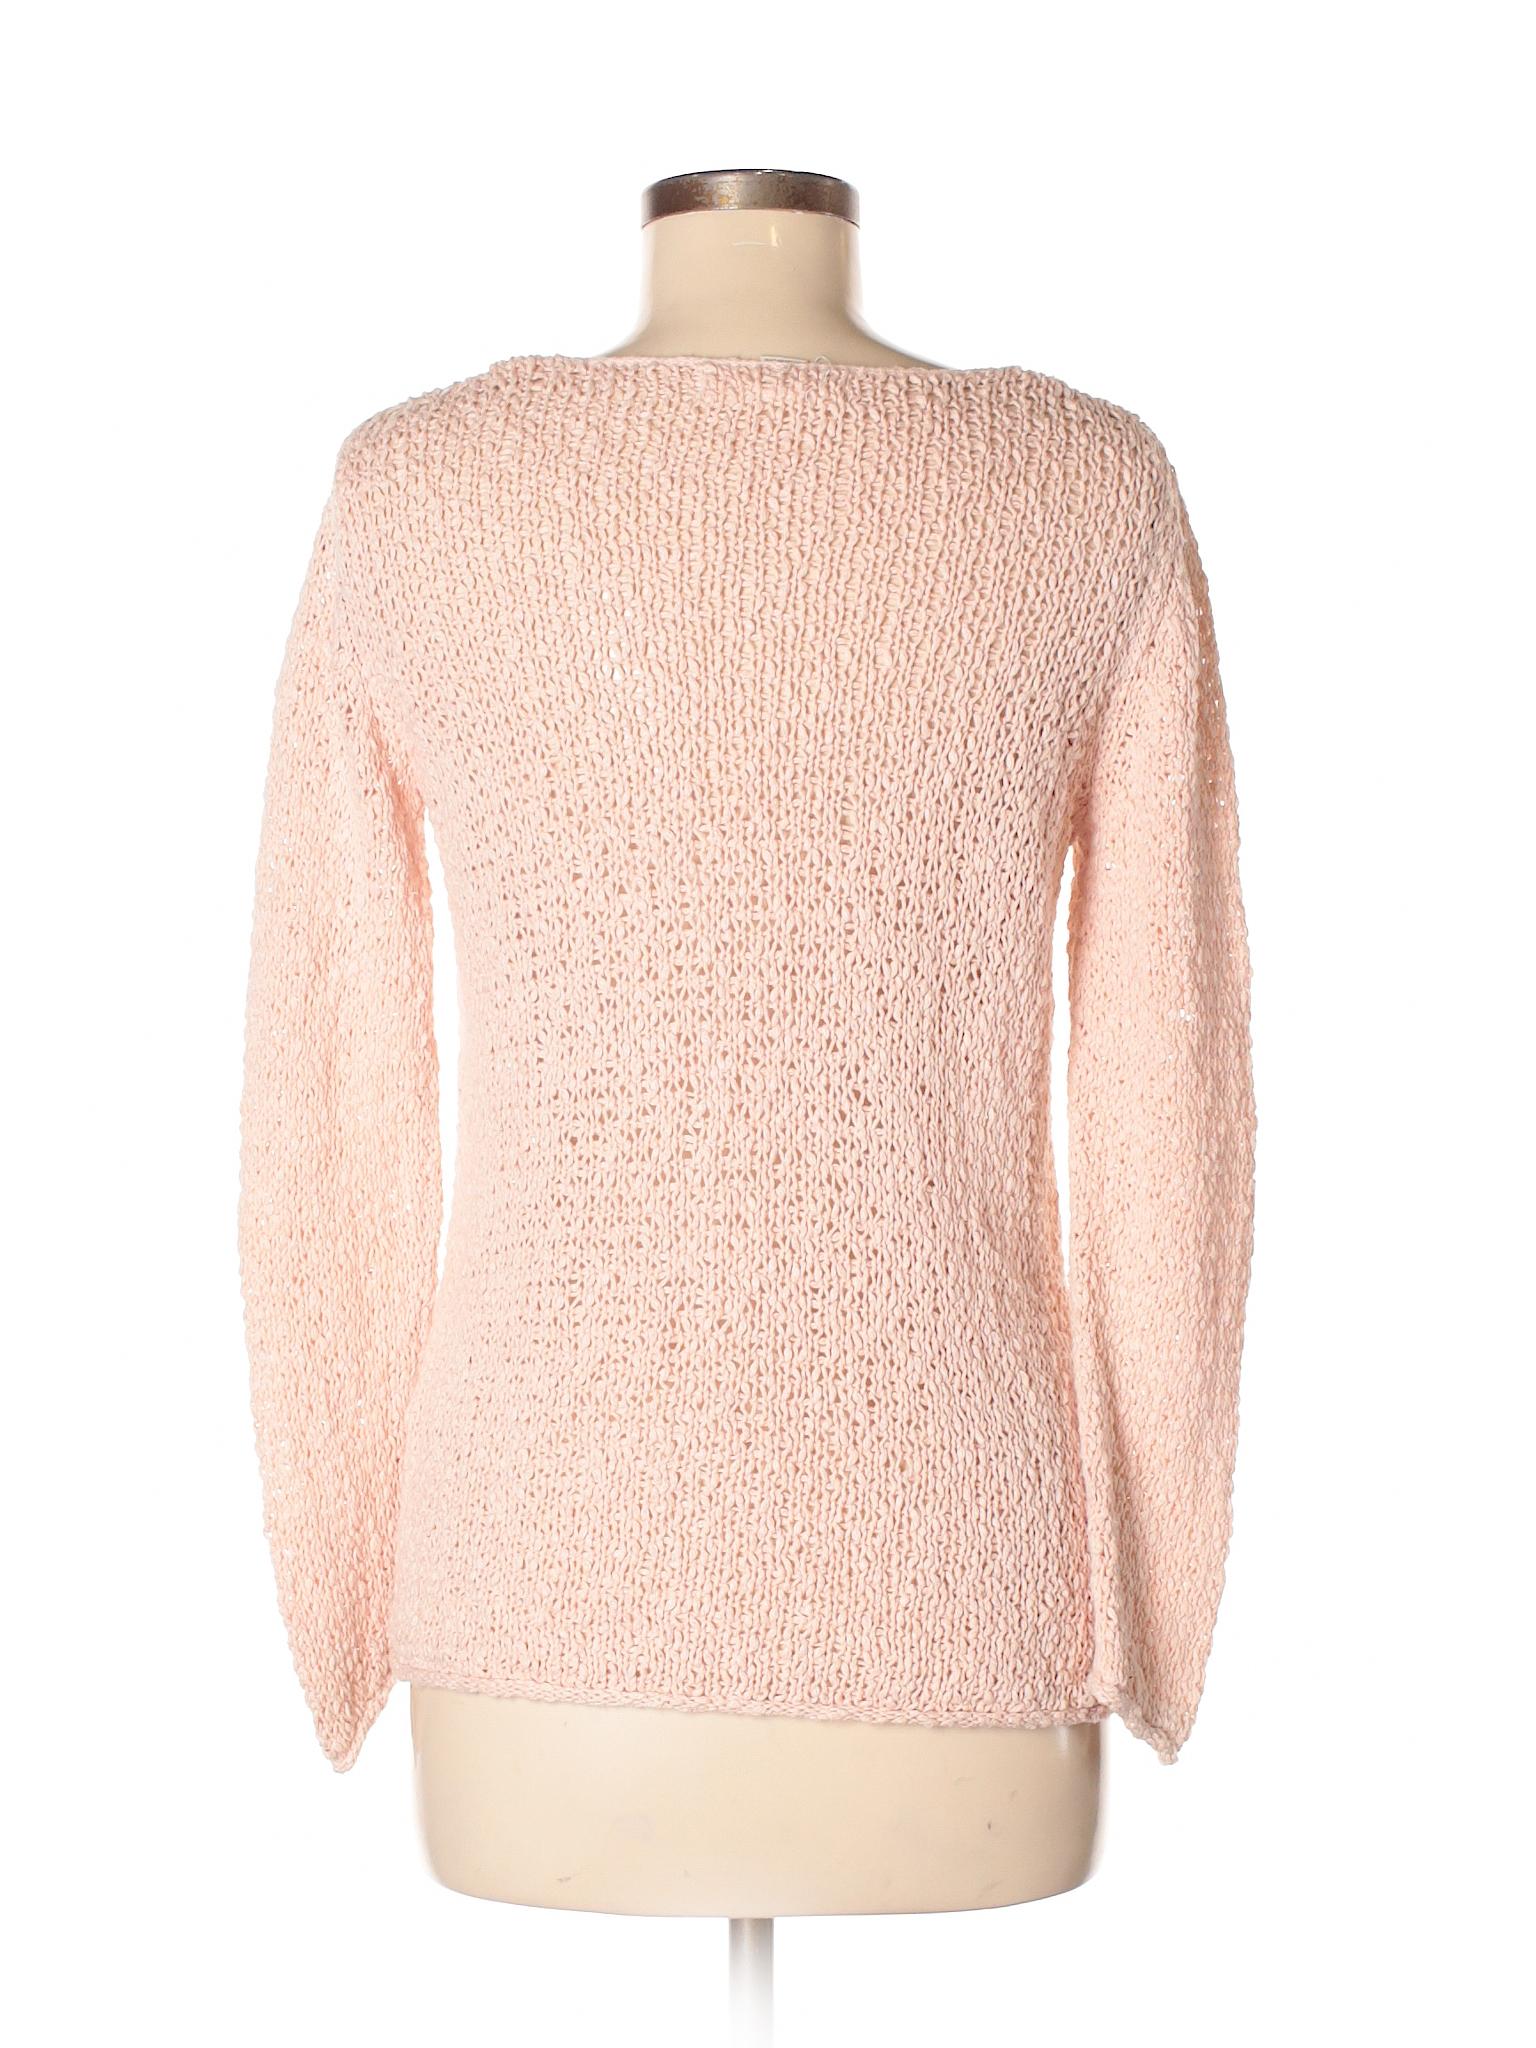 Forever Pullover Pullover Pullover 21 Boutique Sweater 21 21 Boutique Boutique Sweater Forever Sweater Boutique Forever gIq0ZT